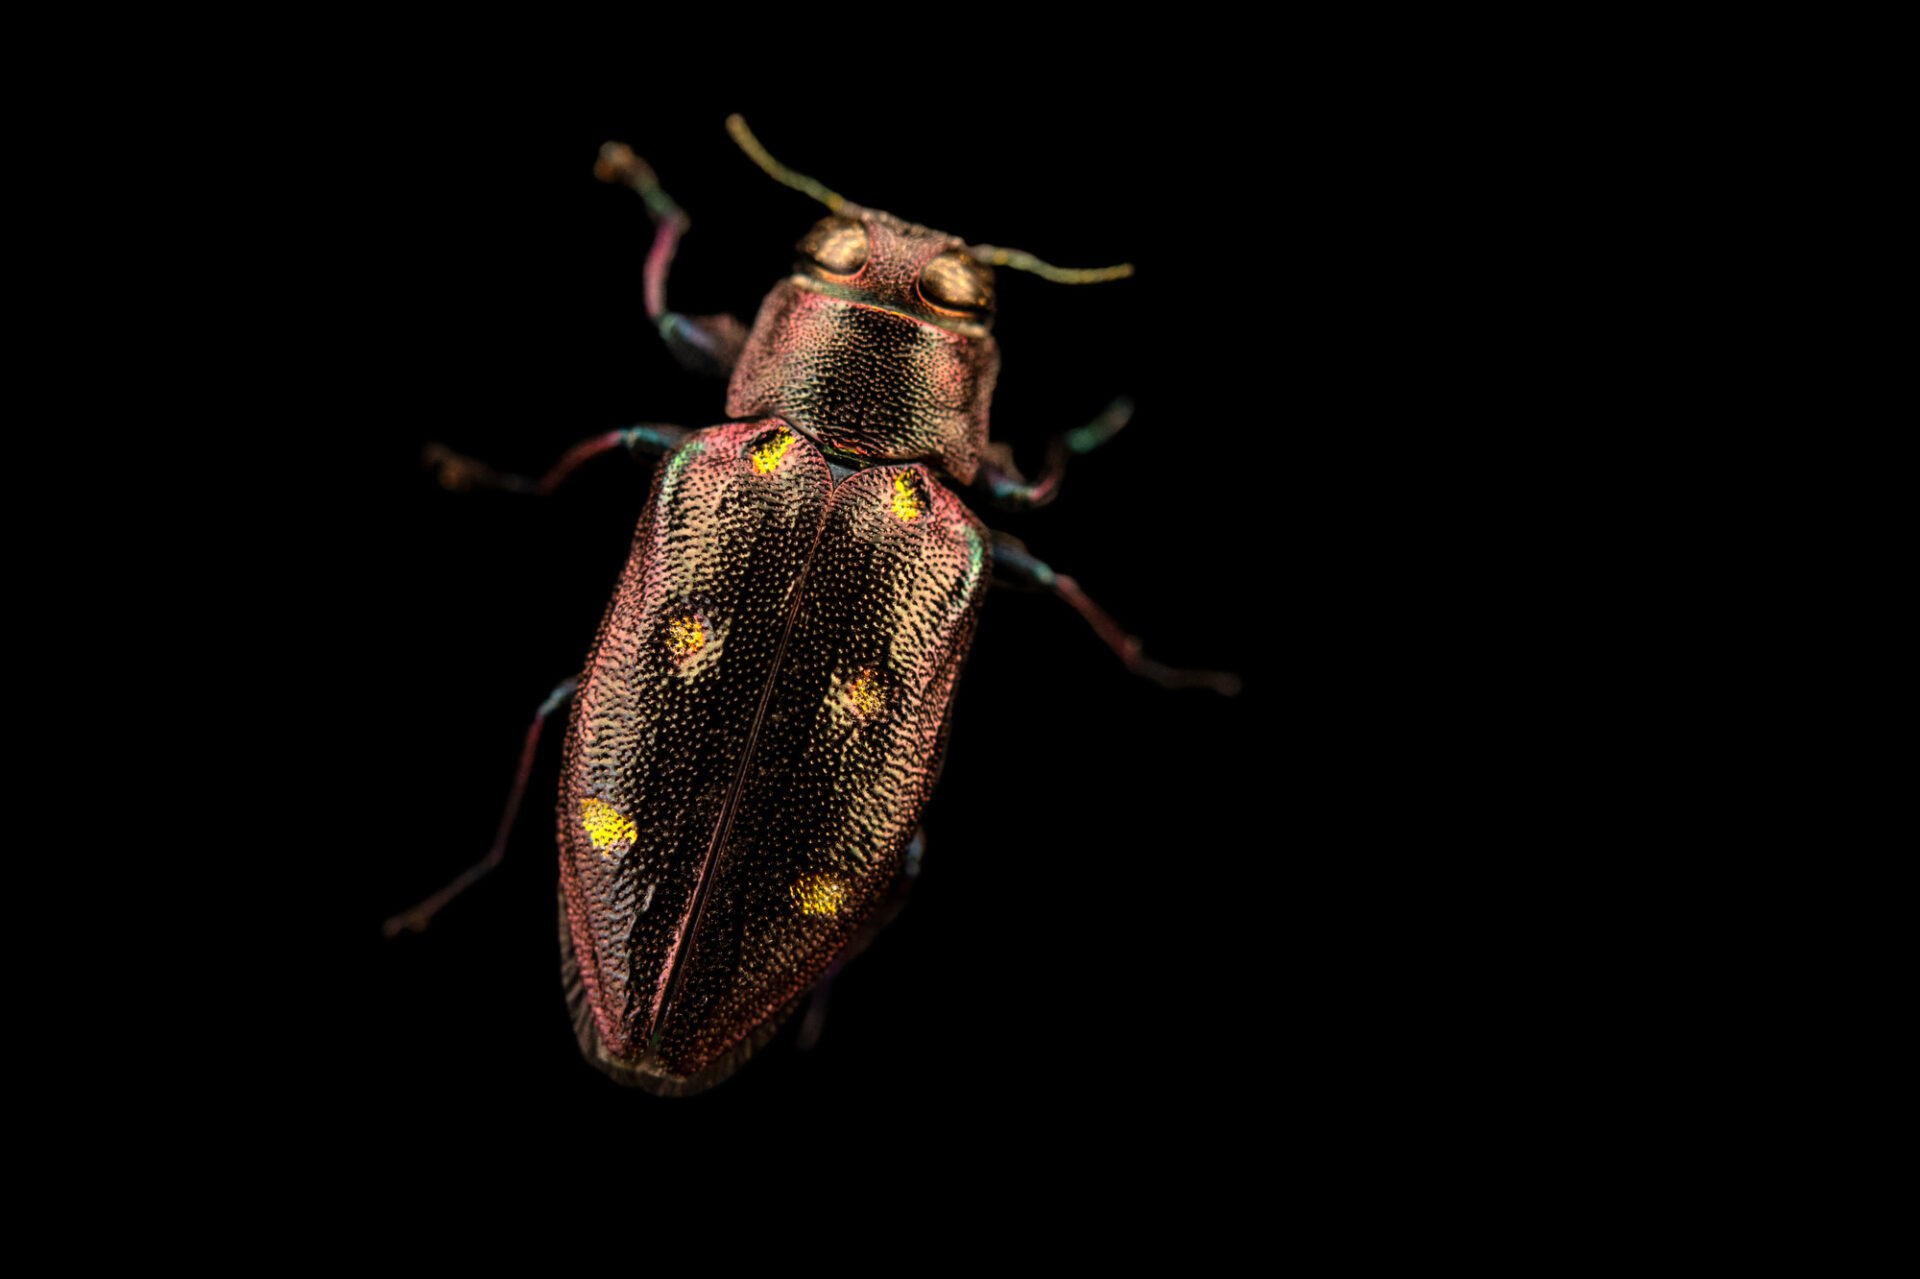 Photo: An emerald beetle (Chrysobothris sexignata) photographed at Spring Creek Prairie Audubon Center near Denton, NE. This animal was originally collected from Bobcat Prairie near Denton, NE.